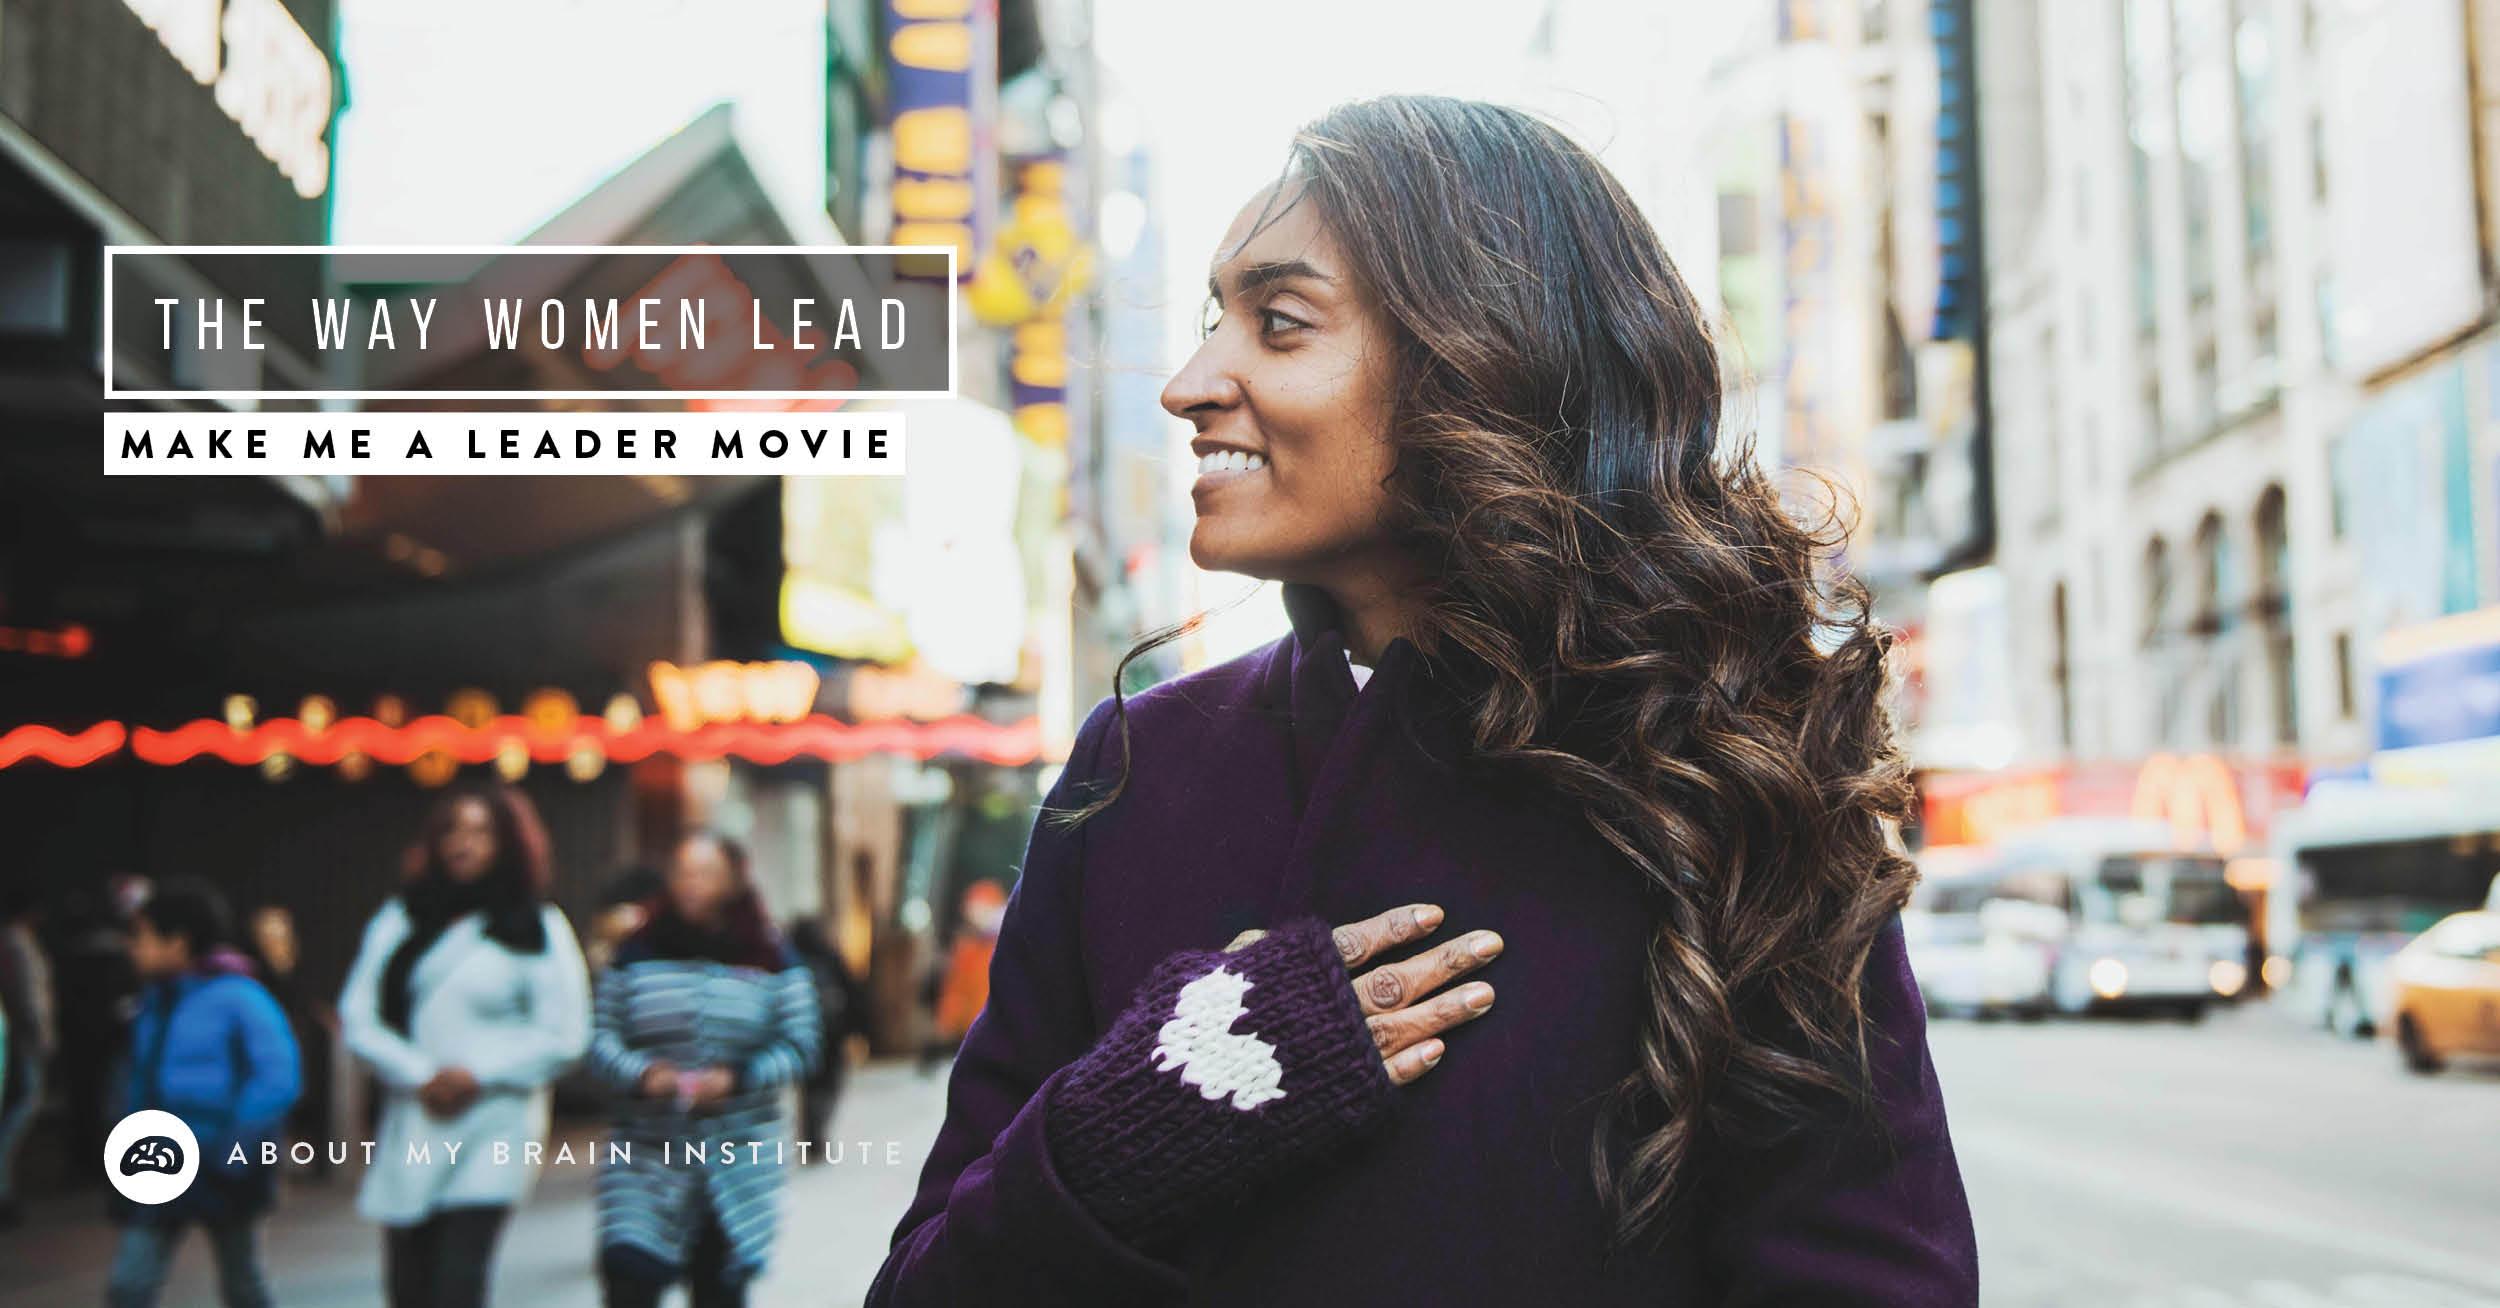 TP-1200x628-The-Way-Women-Lead